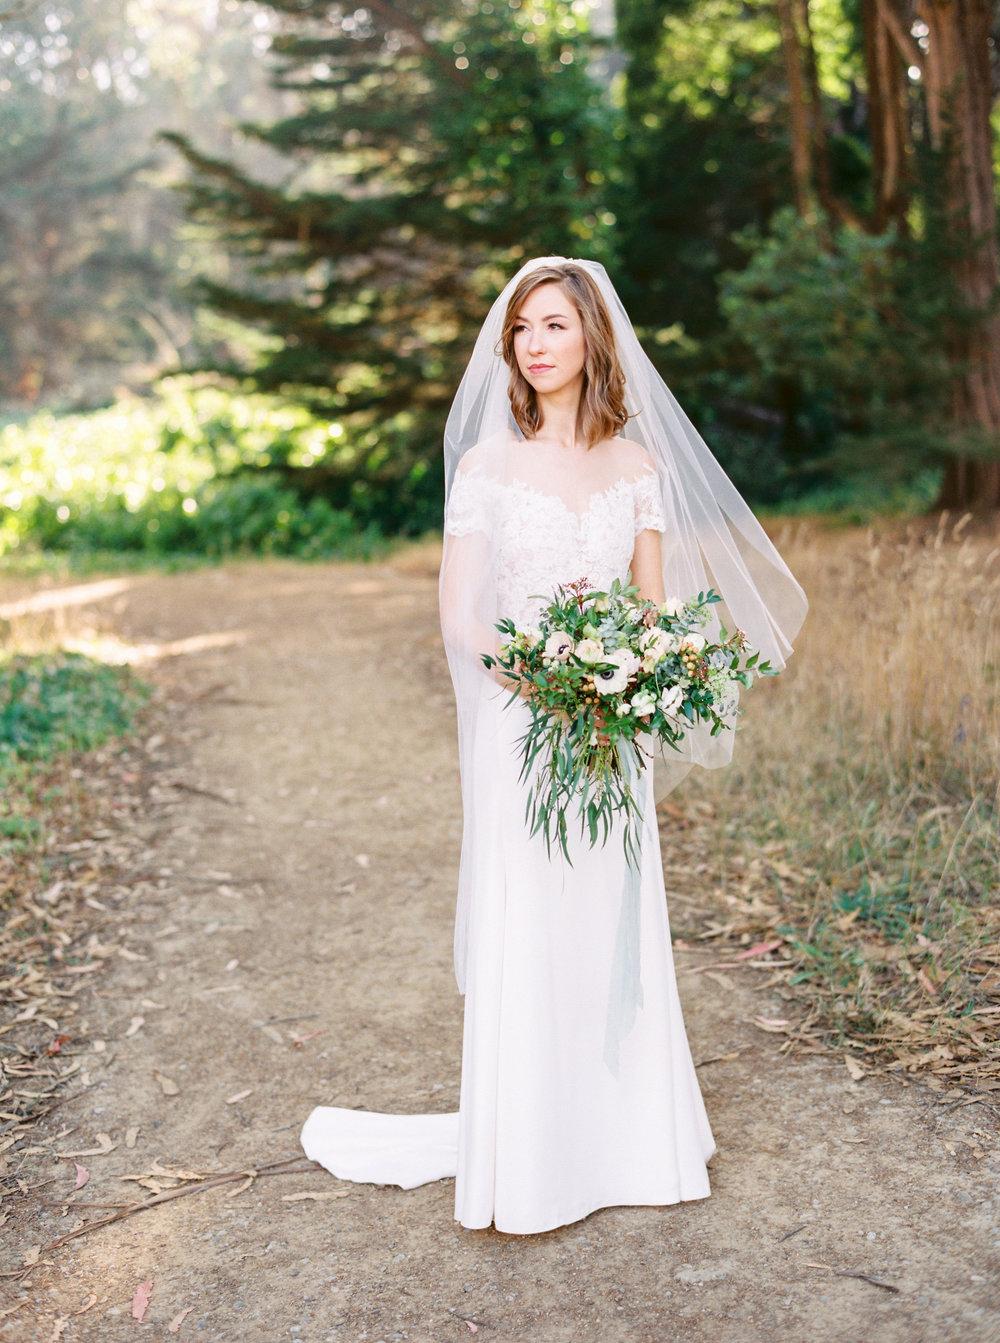 Log-cabin-wedding-in-presidio-san-francisco-california-desintation-wedding-photography-148.jpg